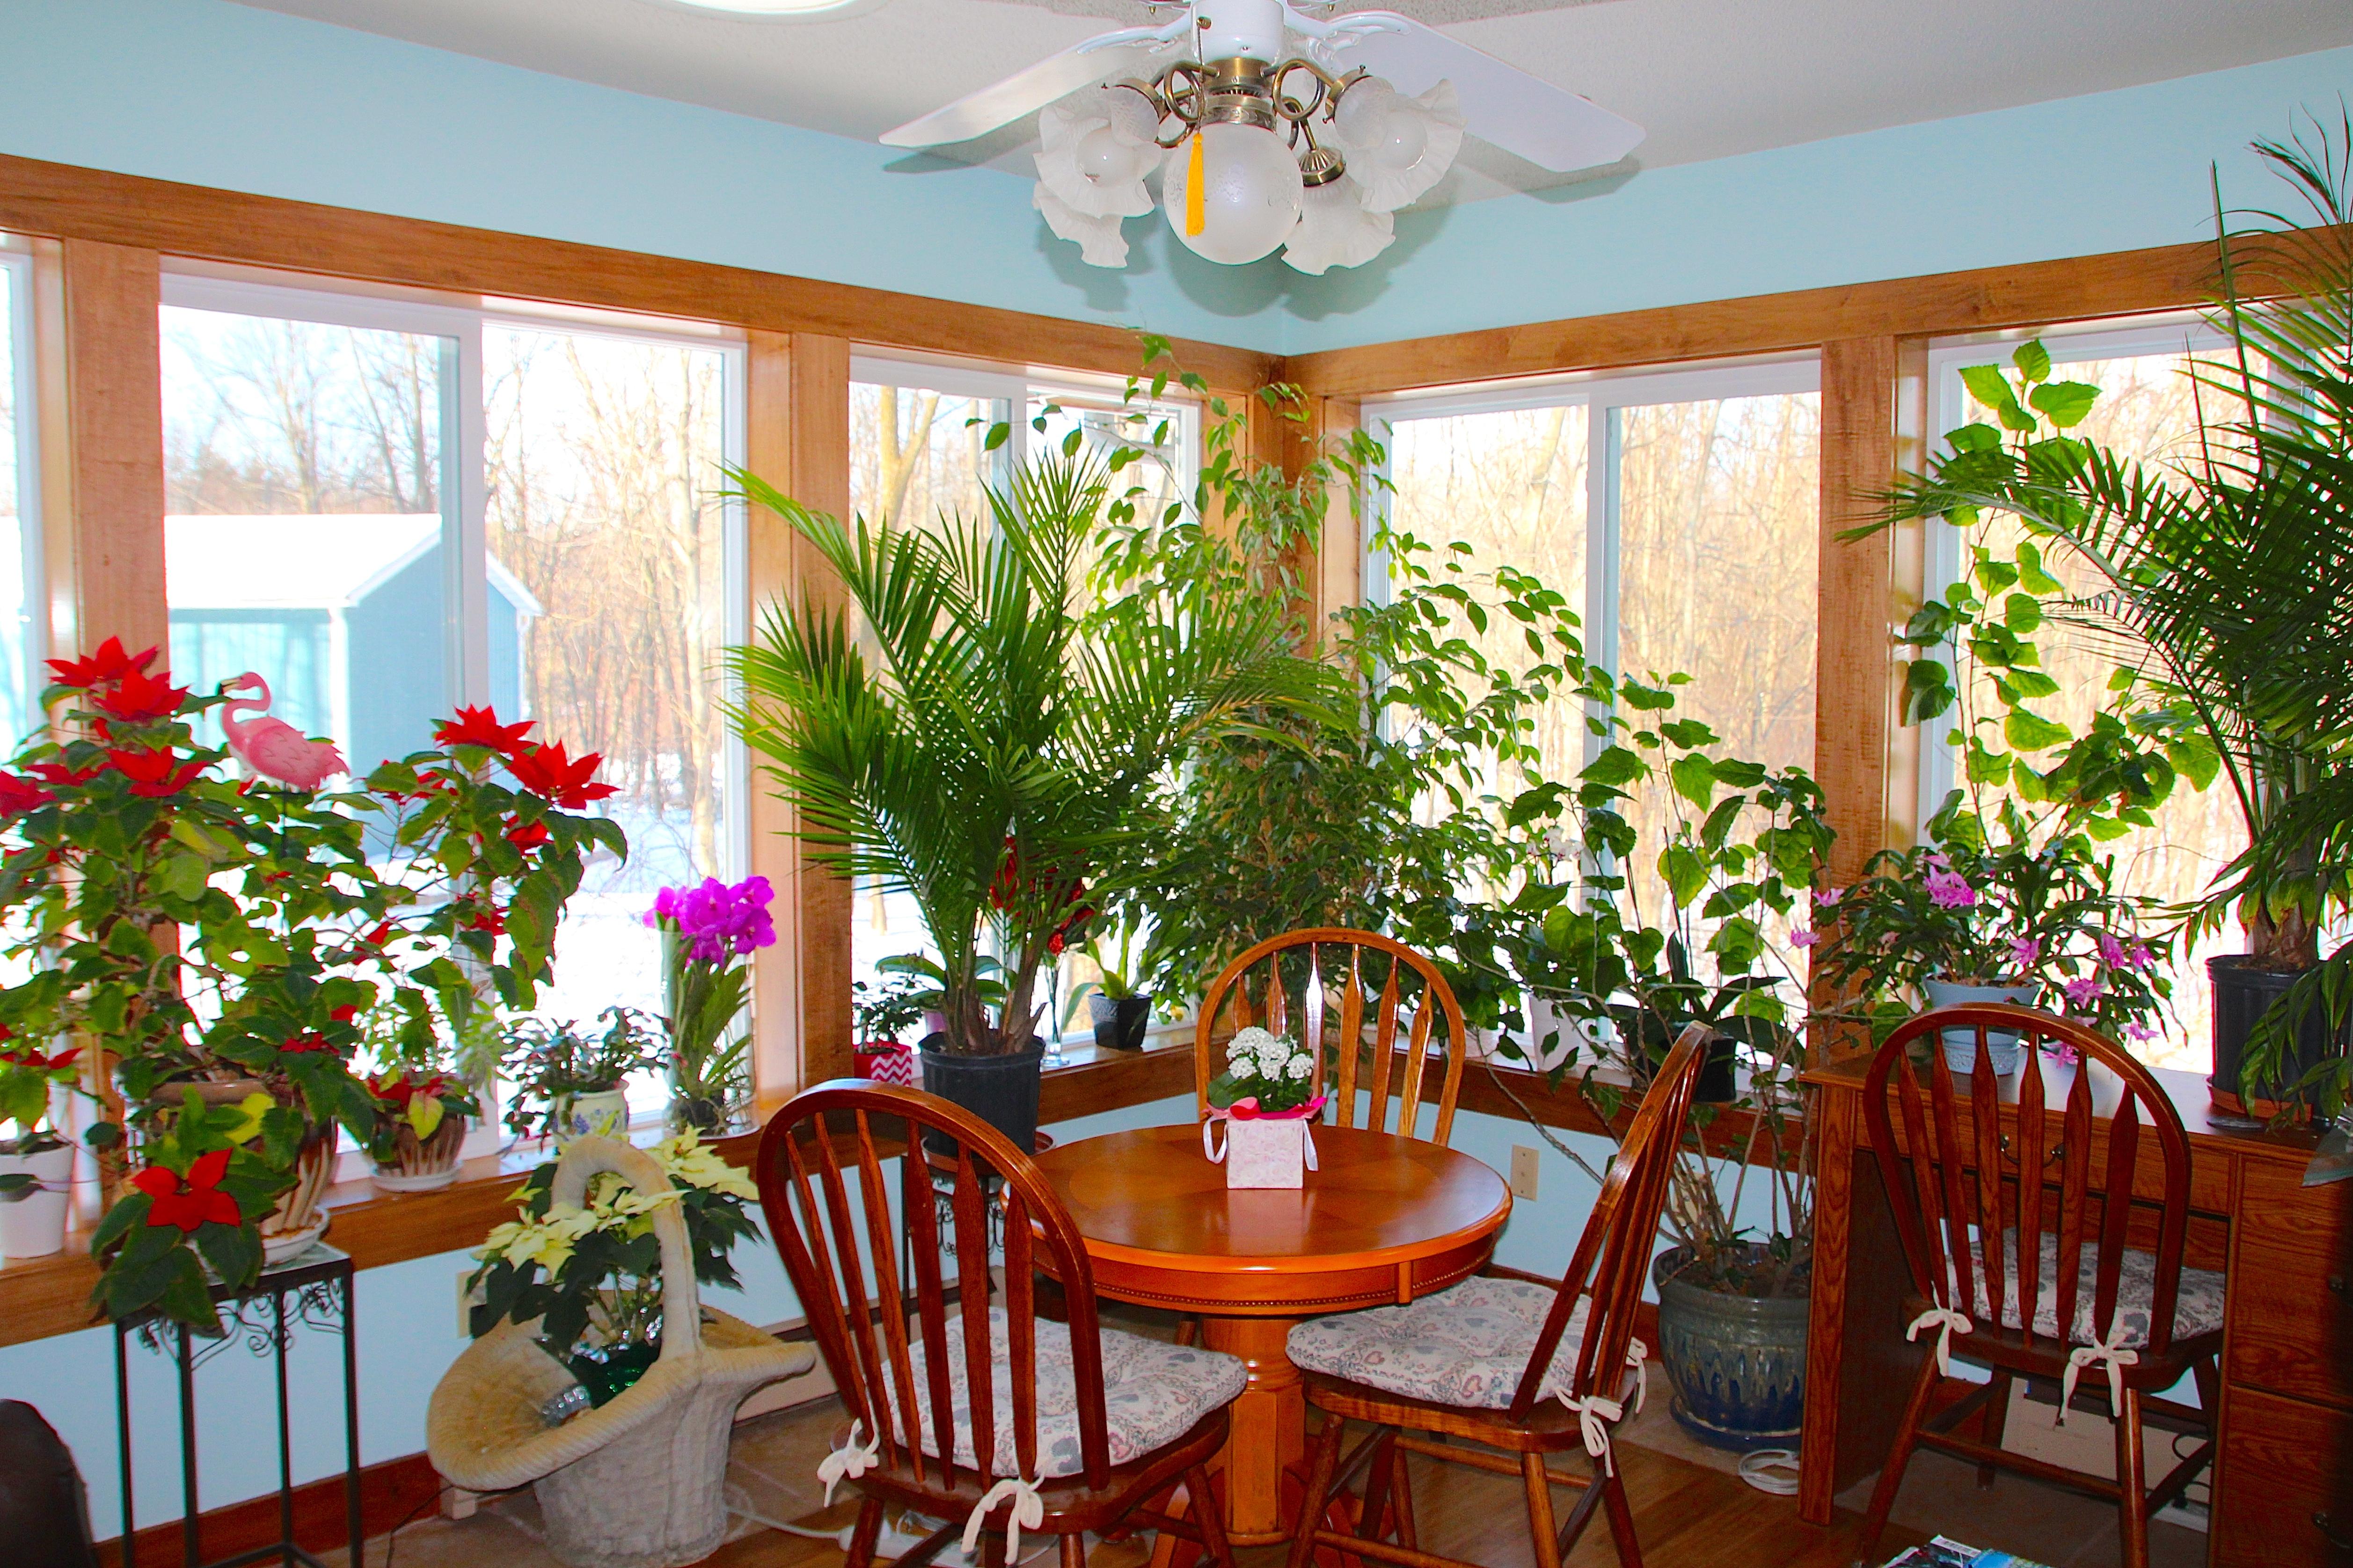 garden-room-2015-winter-copy